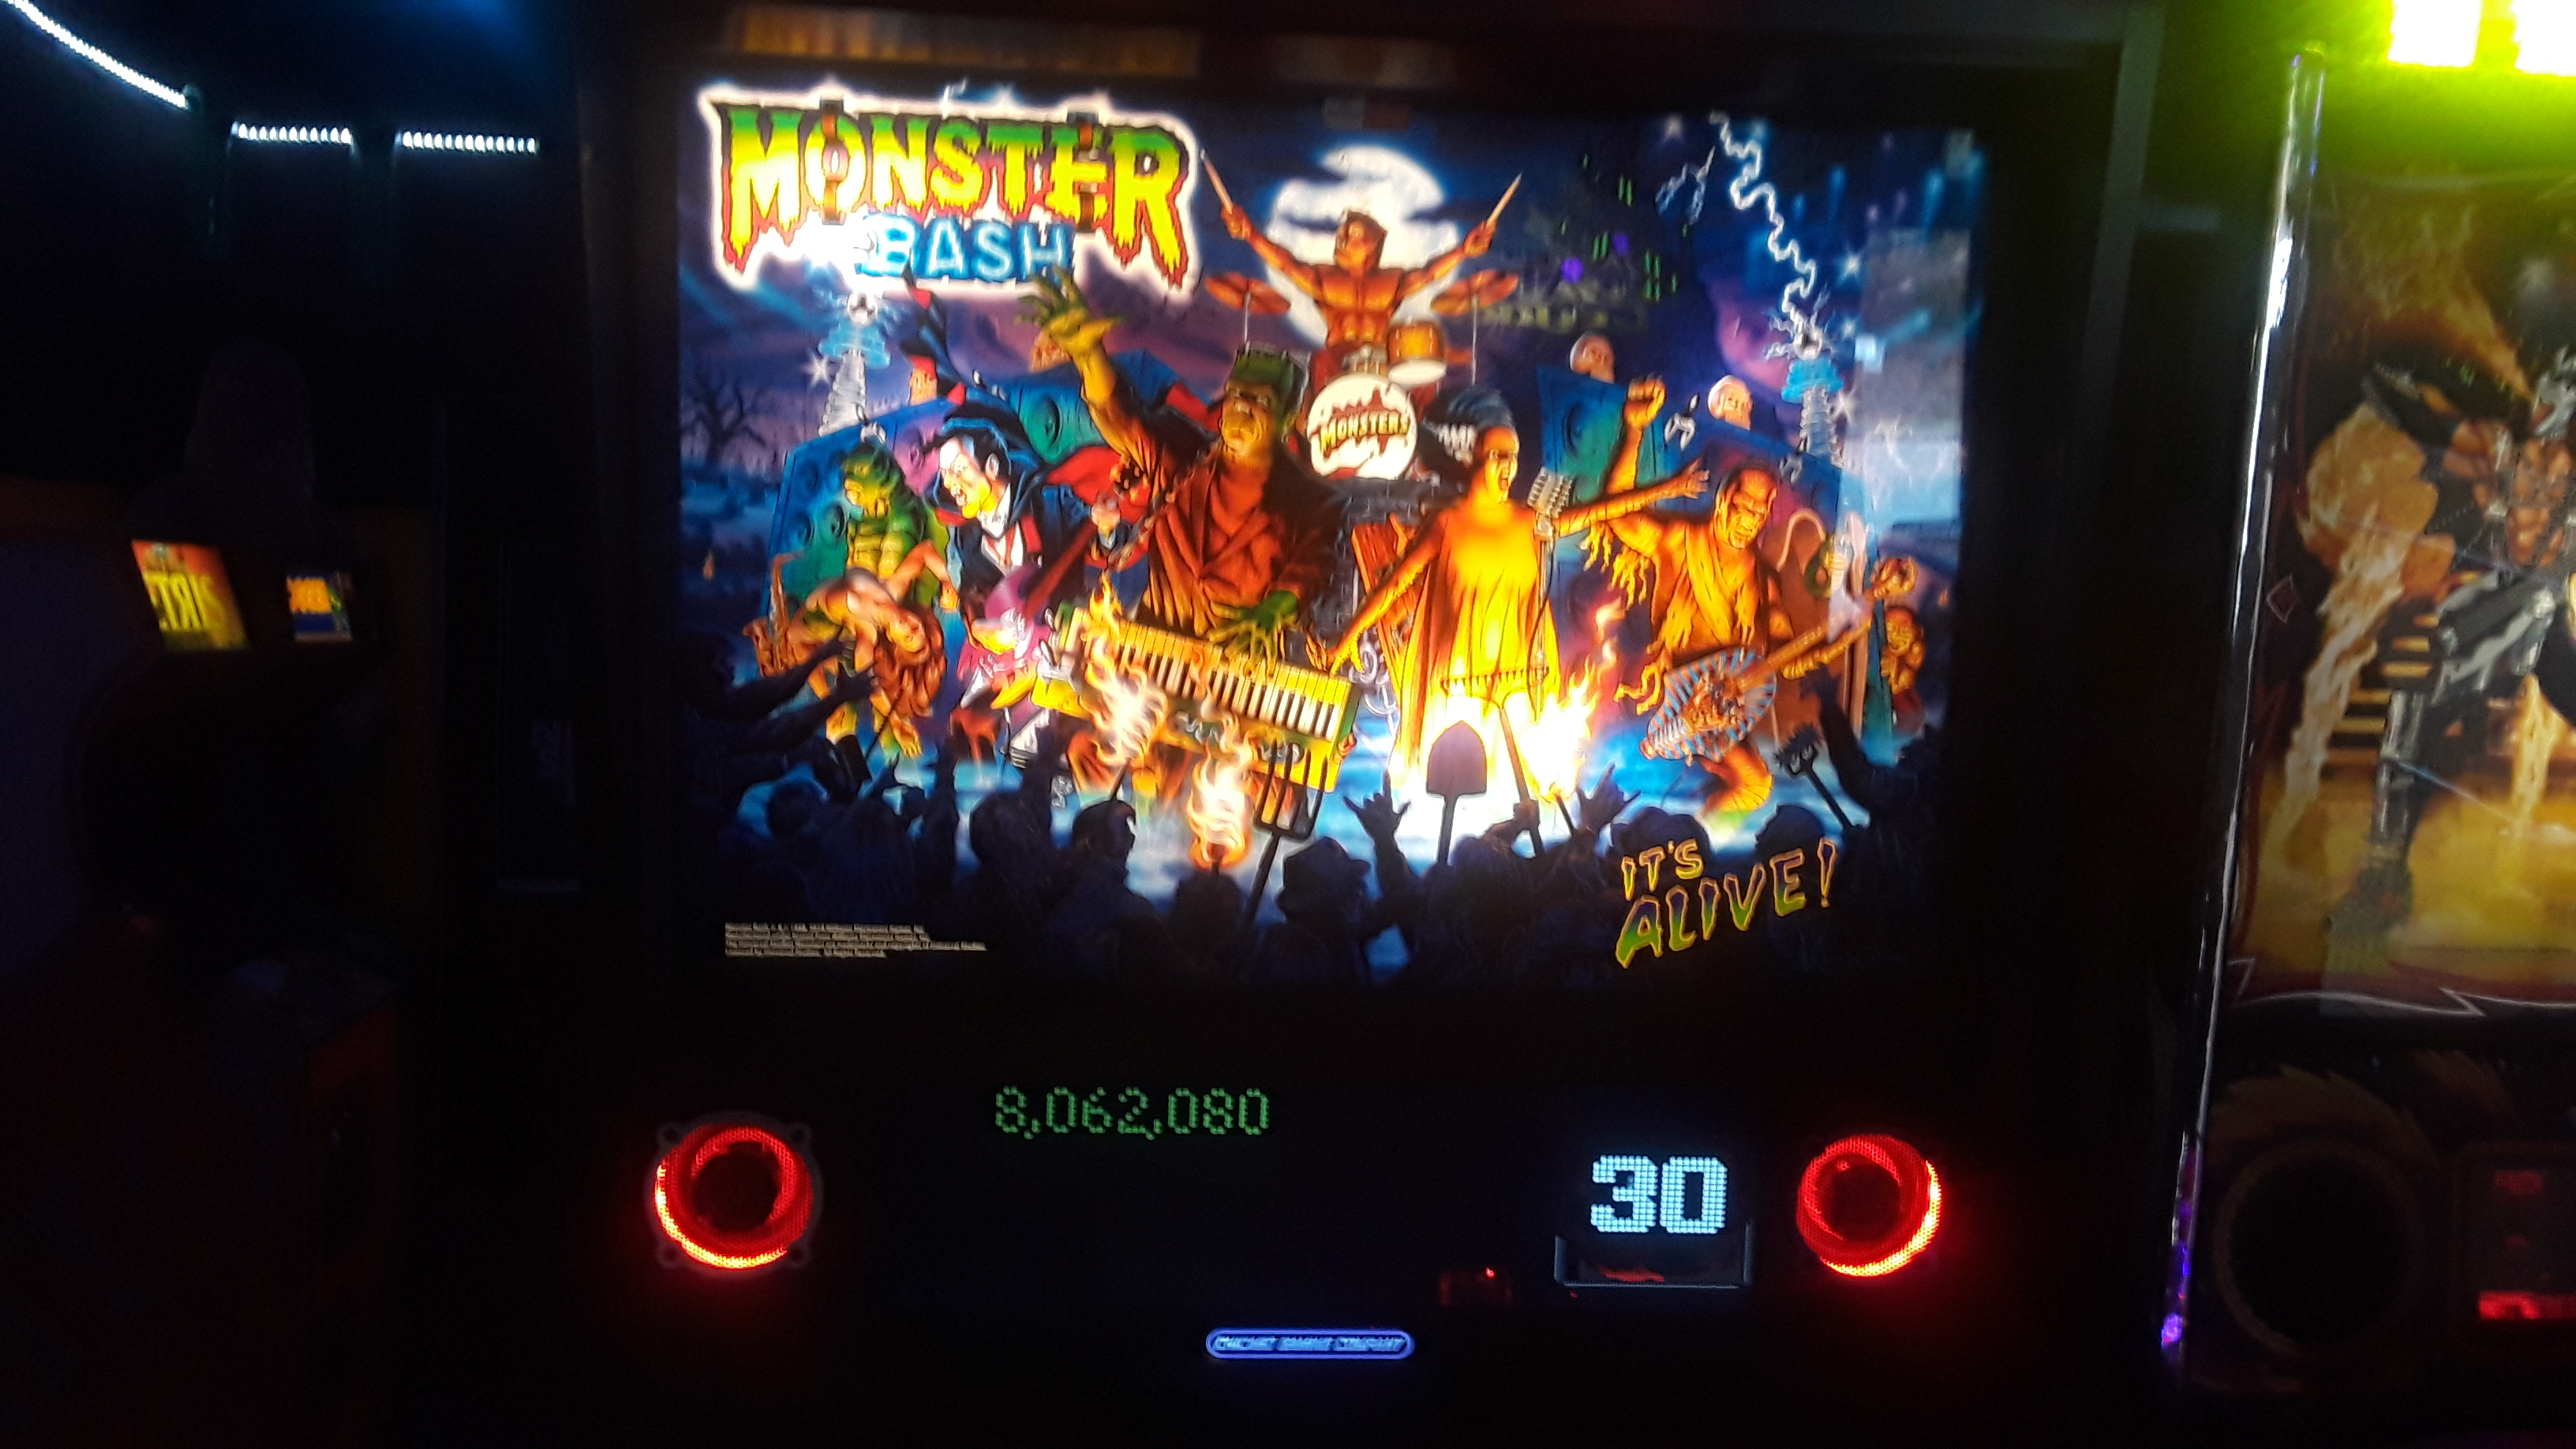 JML101582: Monster Bash (Pinball: 3 Balls) 8,062,080 points on 2019-11-16 16:36:27